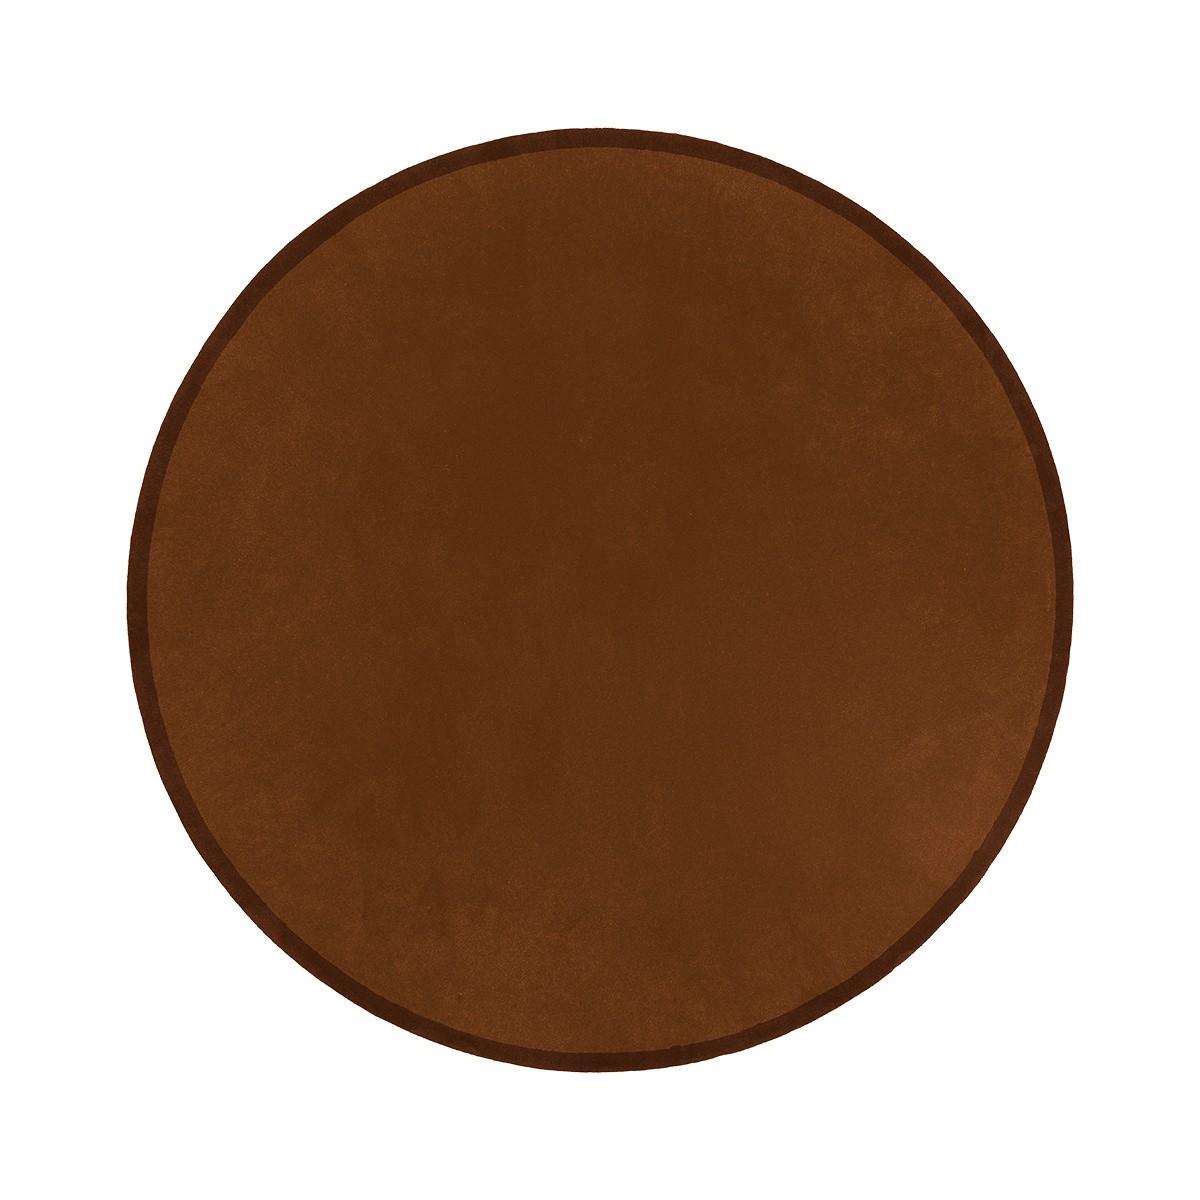 Luna Chocolate Round Rug